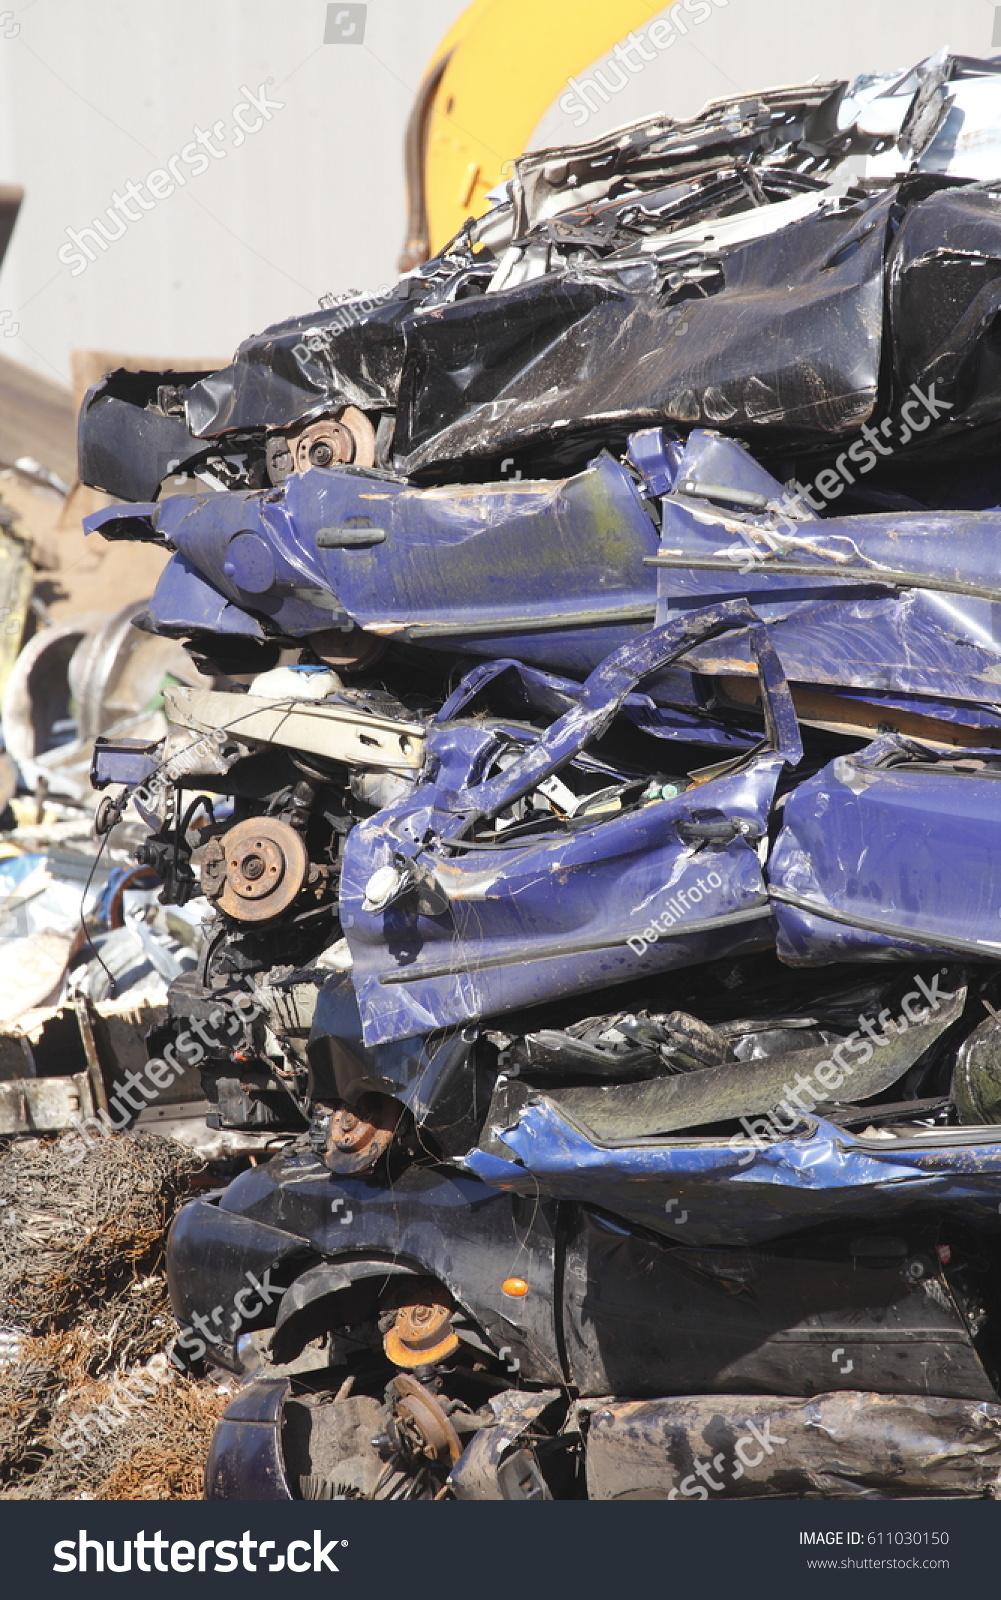 Scrap Metal Cars On Scrap Yard Stock Photo 611030150 - Shutterstock